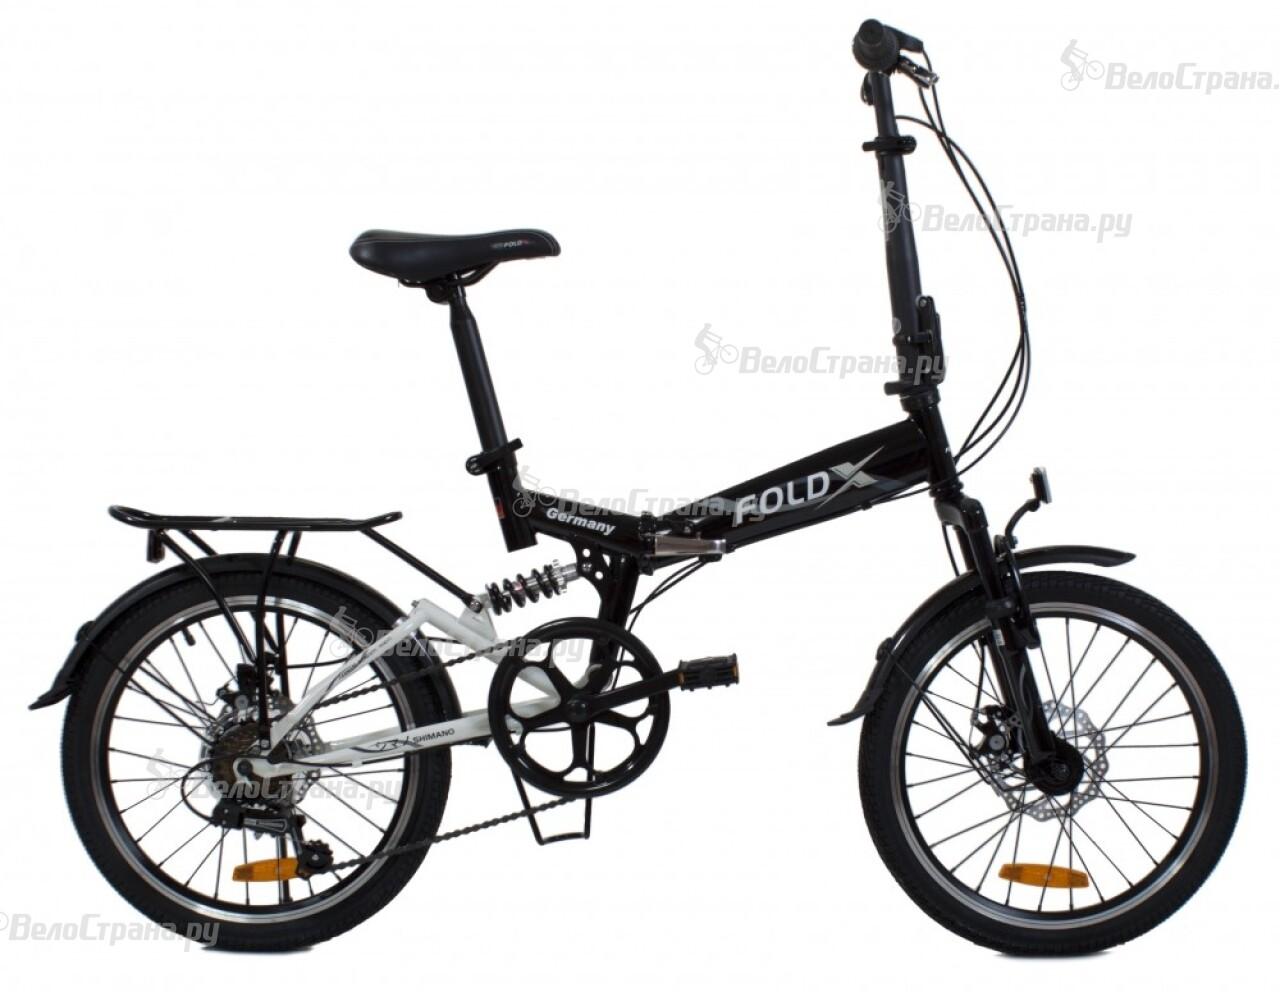 Велосипед FoldX Tokyo (2016) велосипед bearbike tokyo